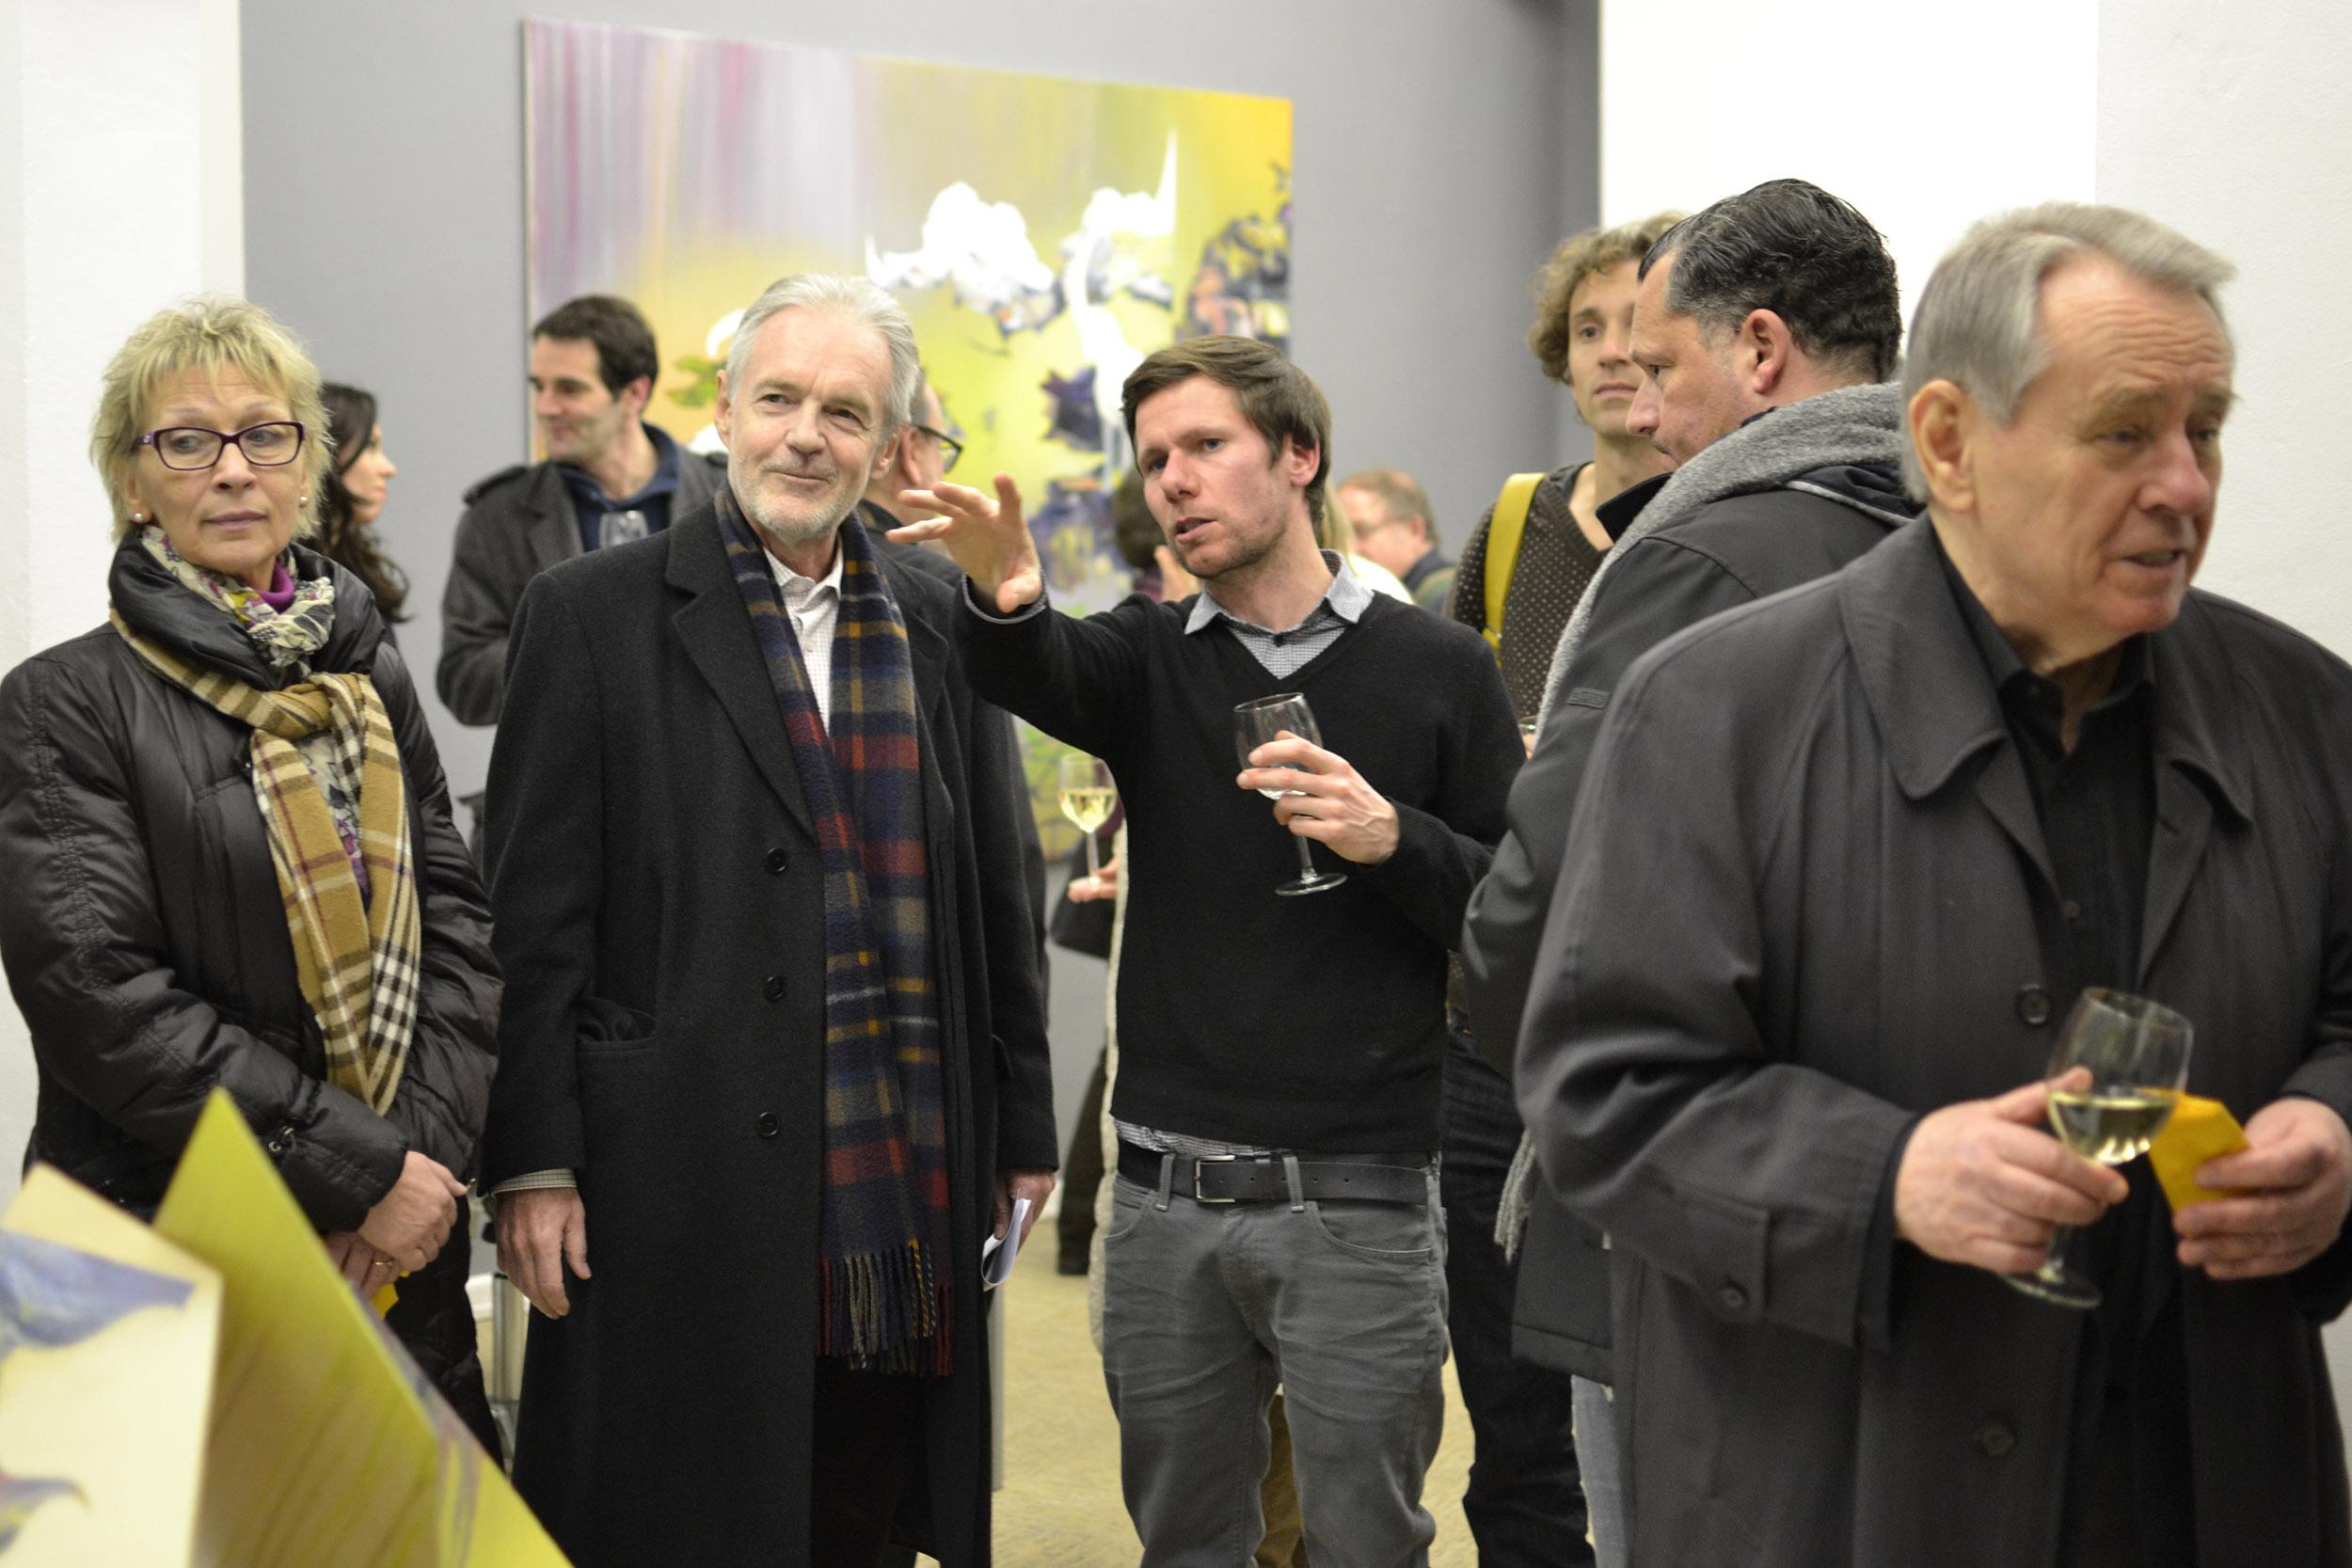 Matthias Moravek, %22Geroell%22, exhibition view6, 2014.jpg